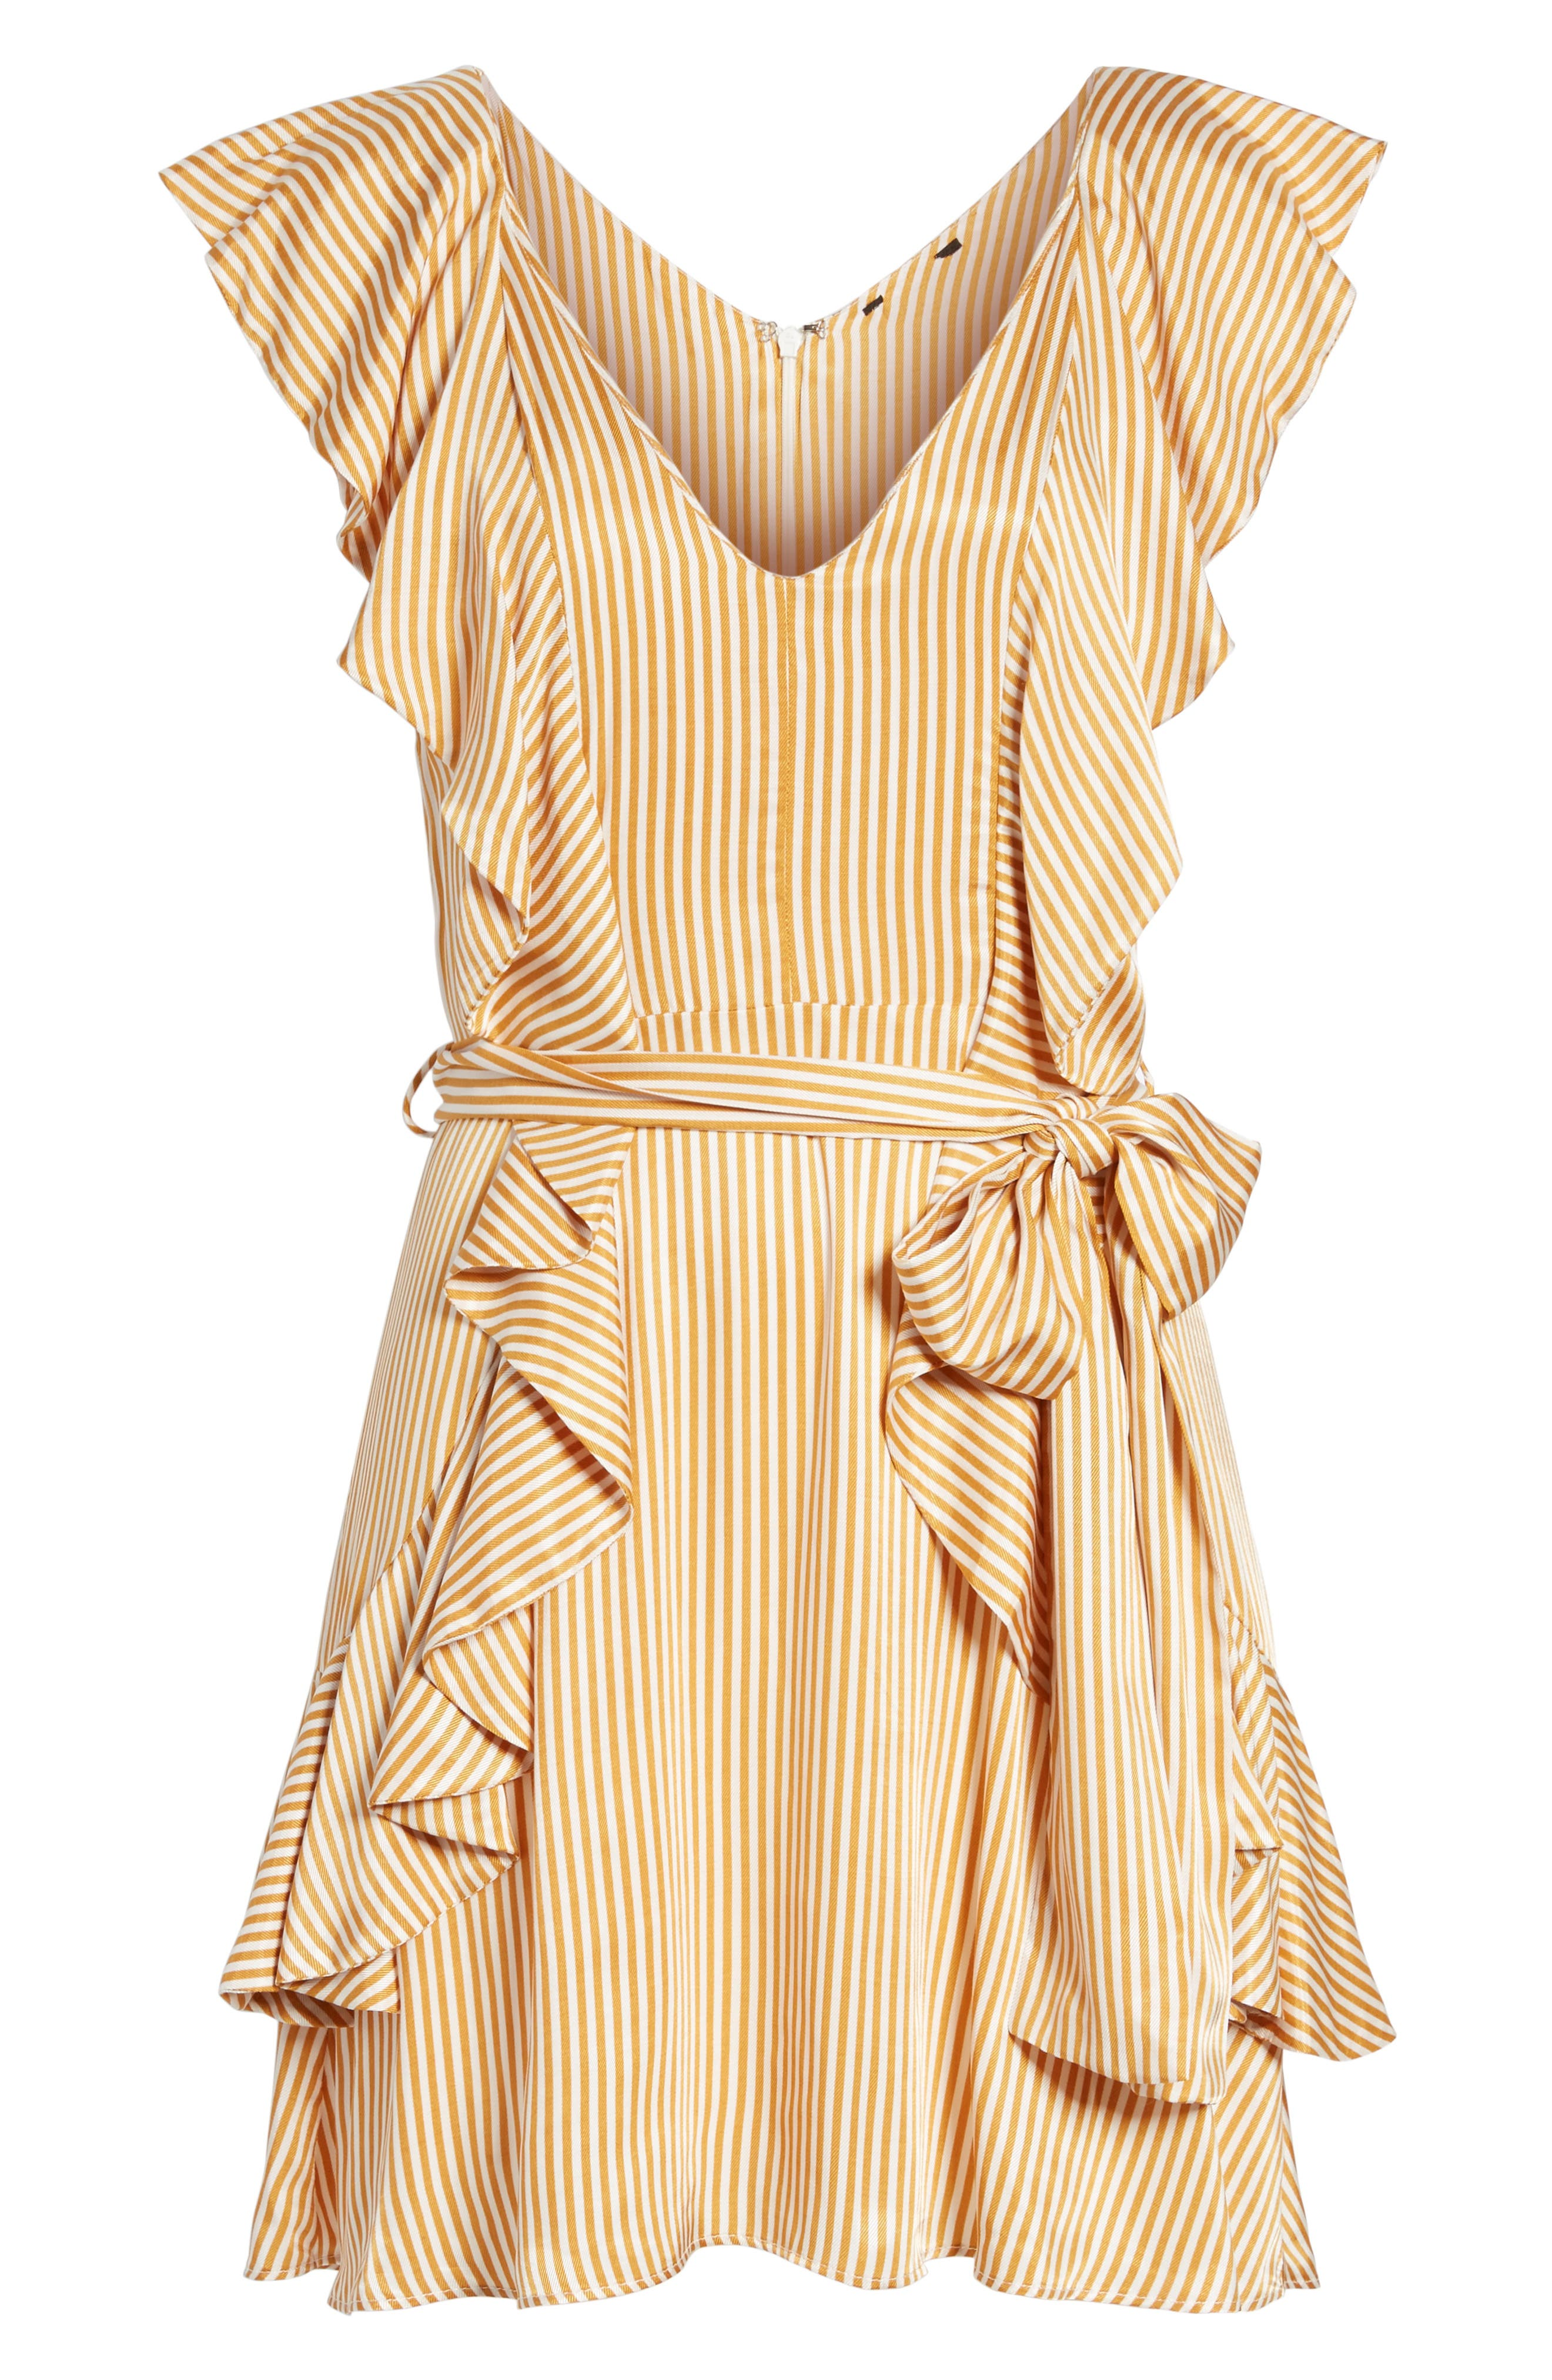 Clara Ruffle Minidress,                             Alternate thumbnail 6, color,                             250